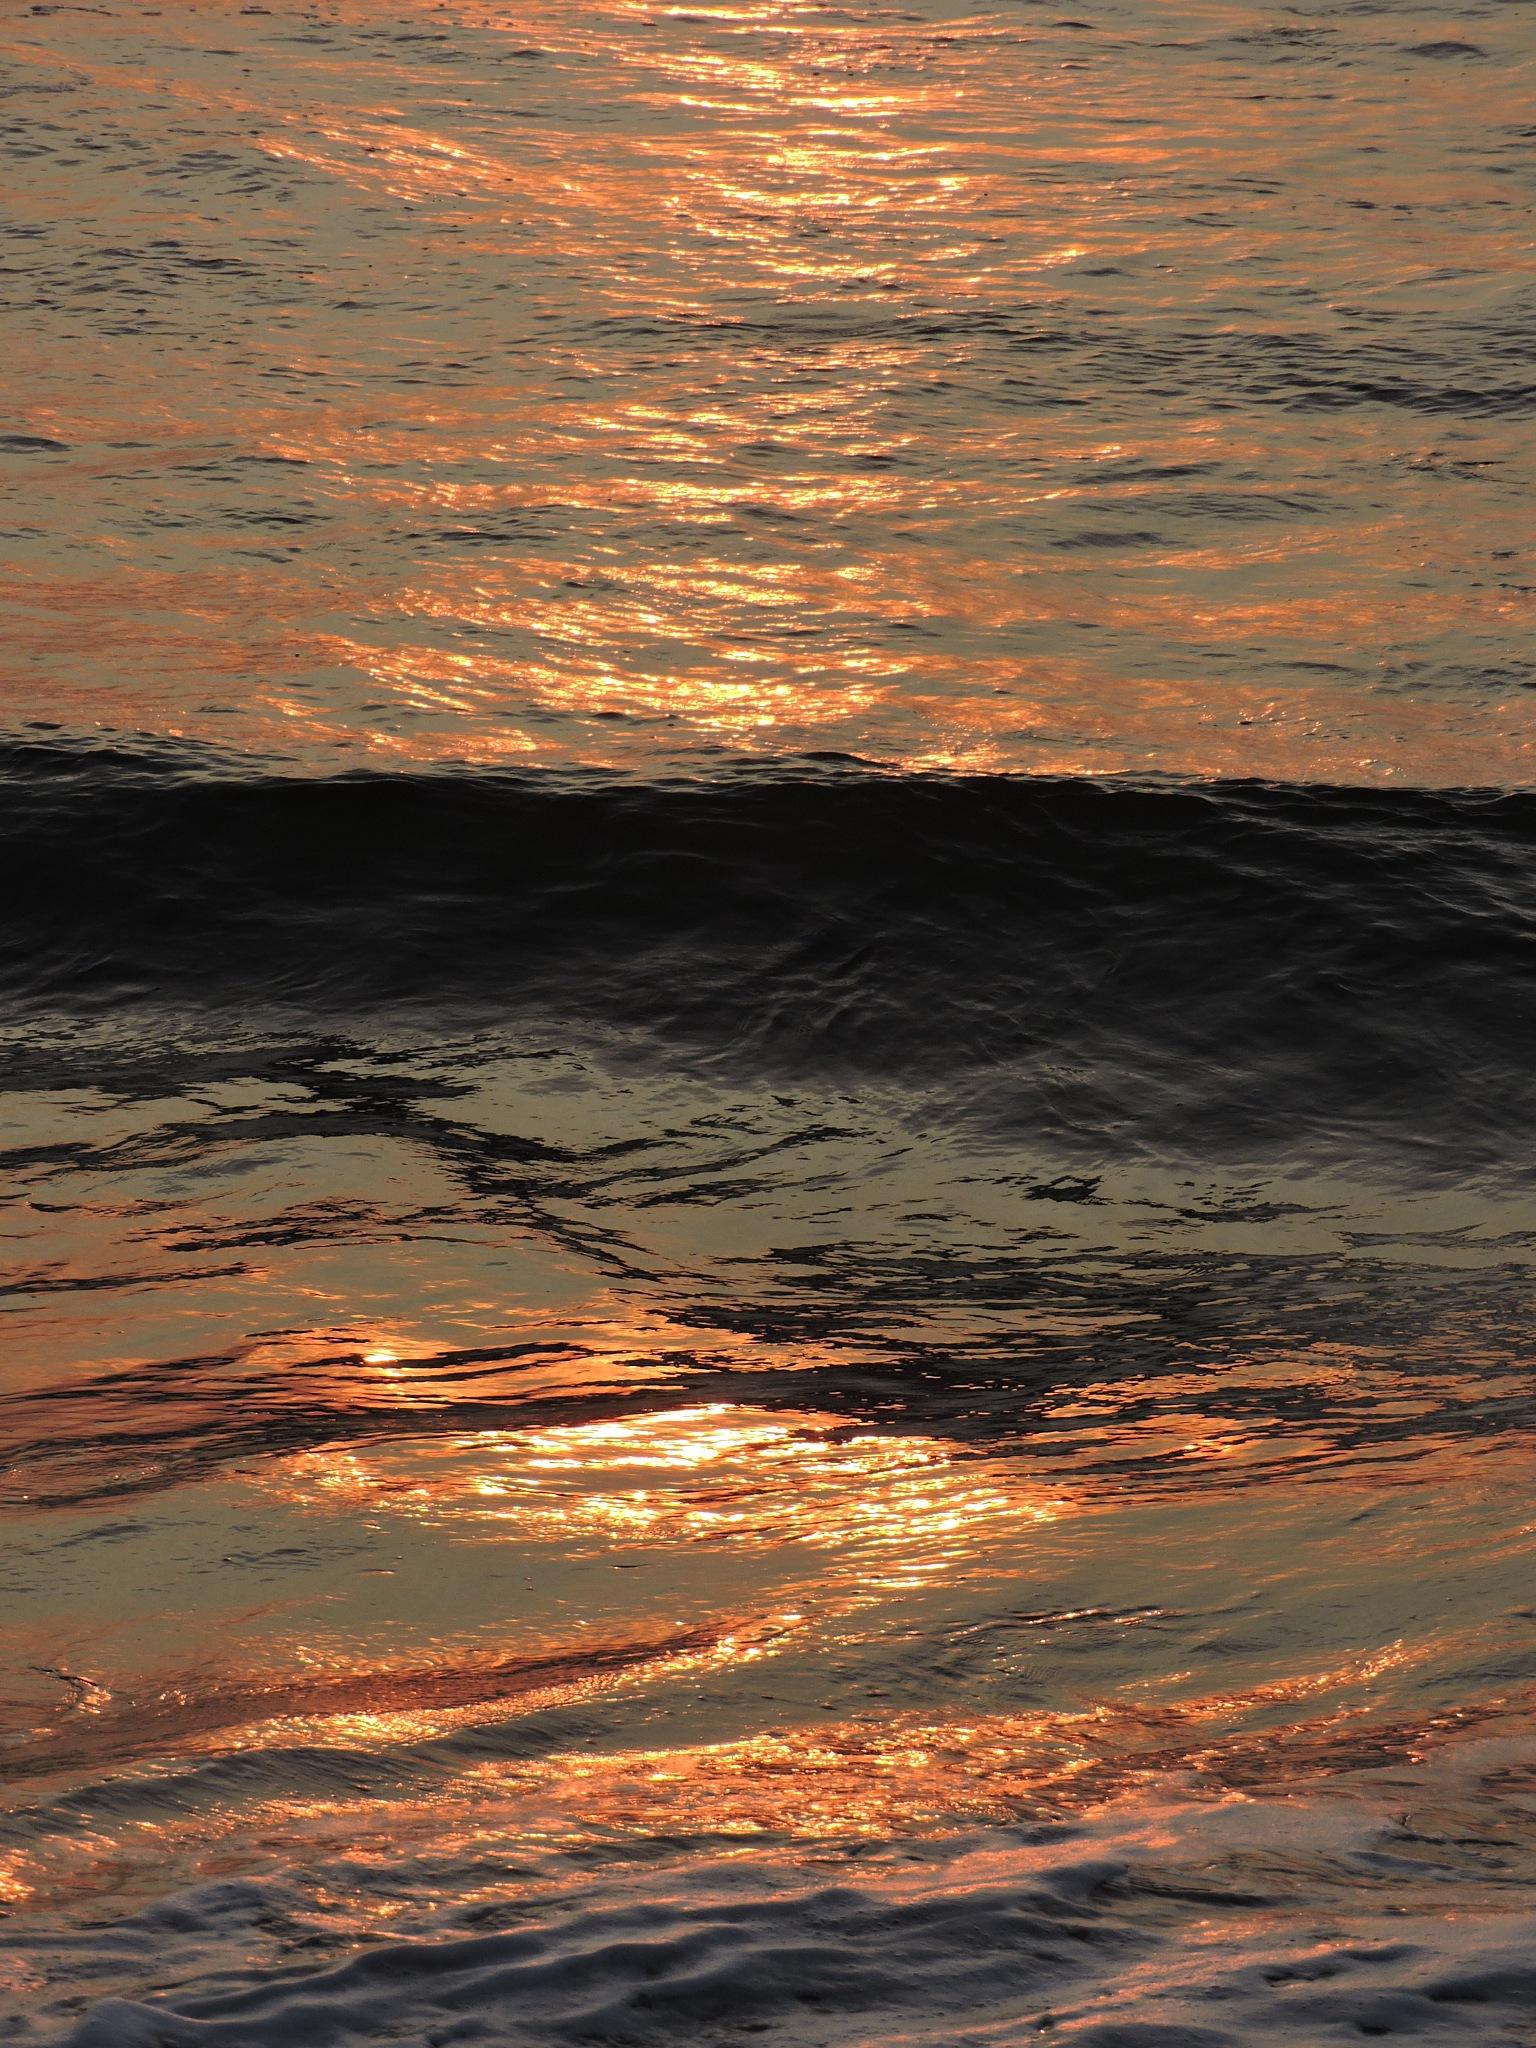 dawn on the ocean  by annapoorna.sitaram